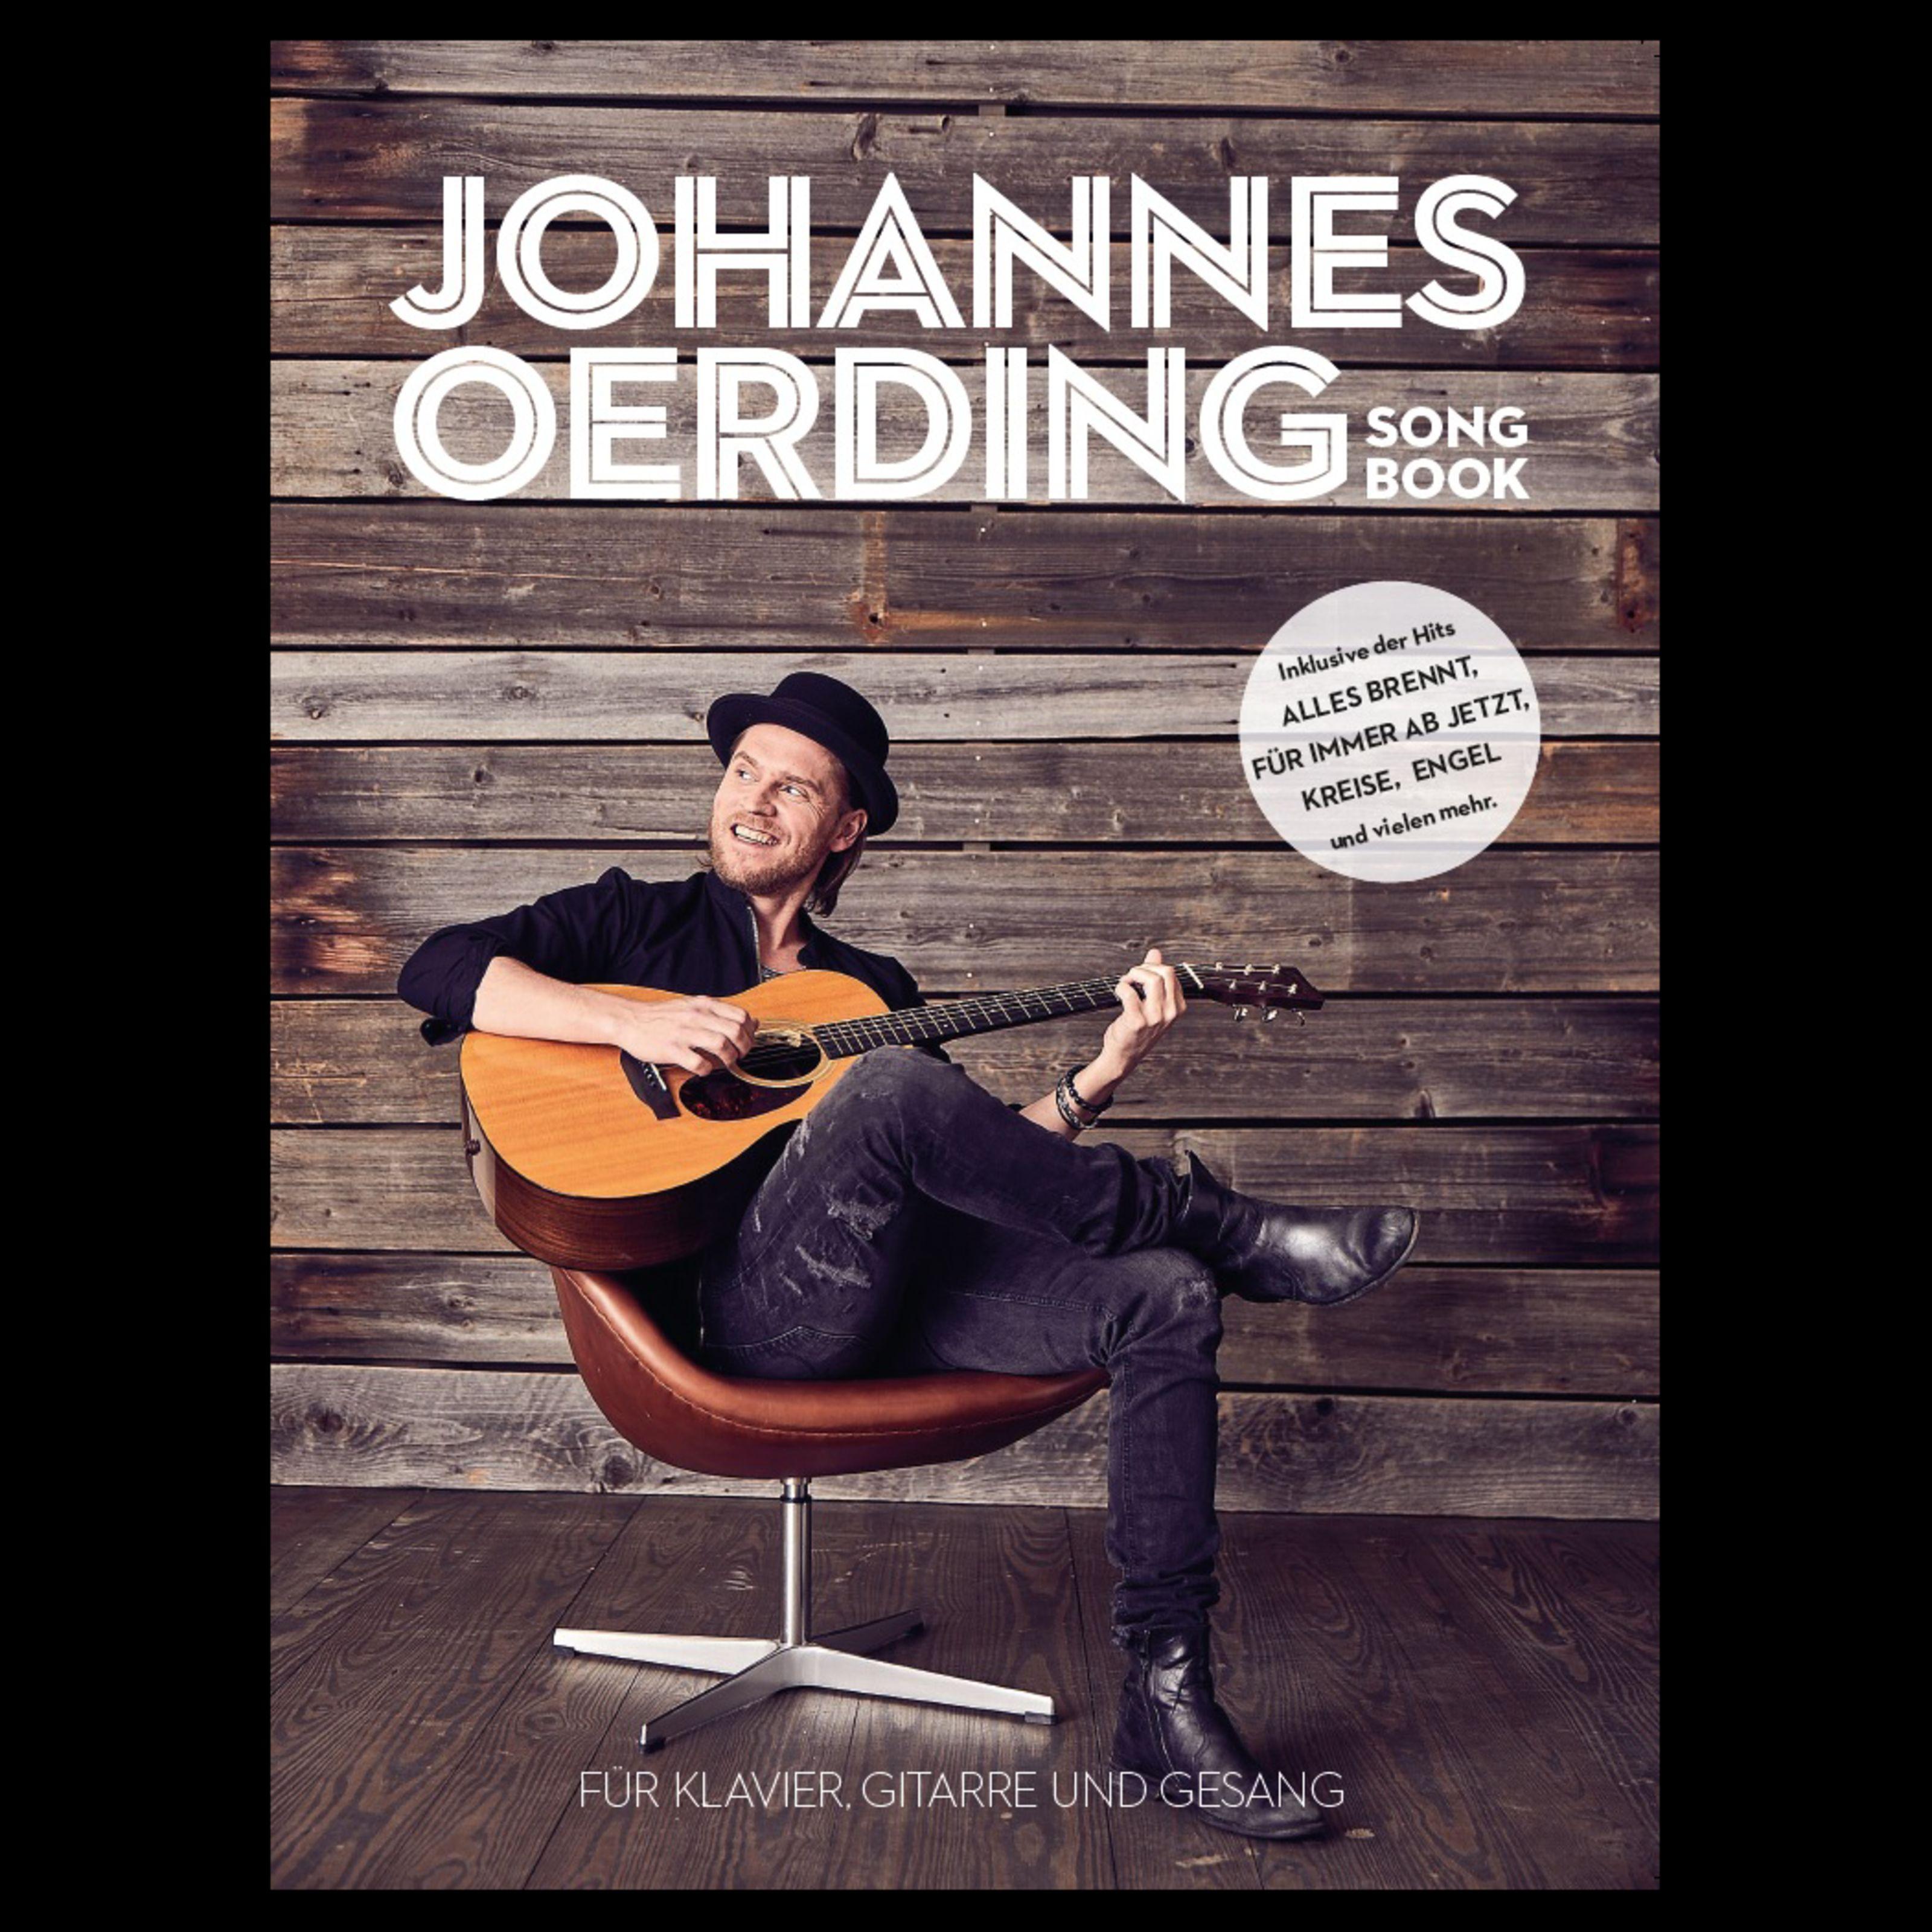 Bosworth Music - Johannes Oerding Songbook